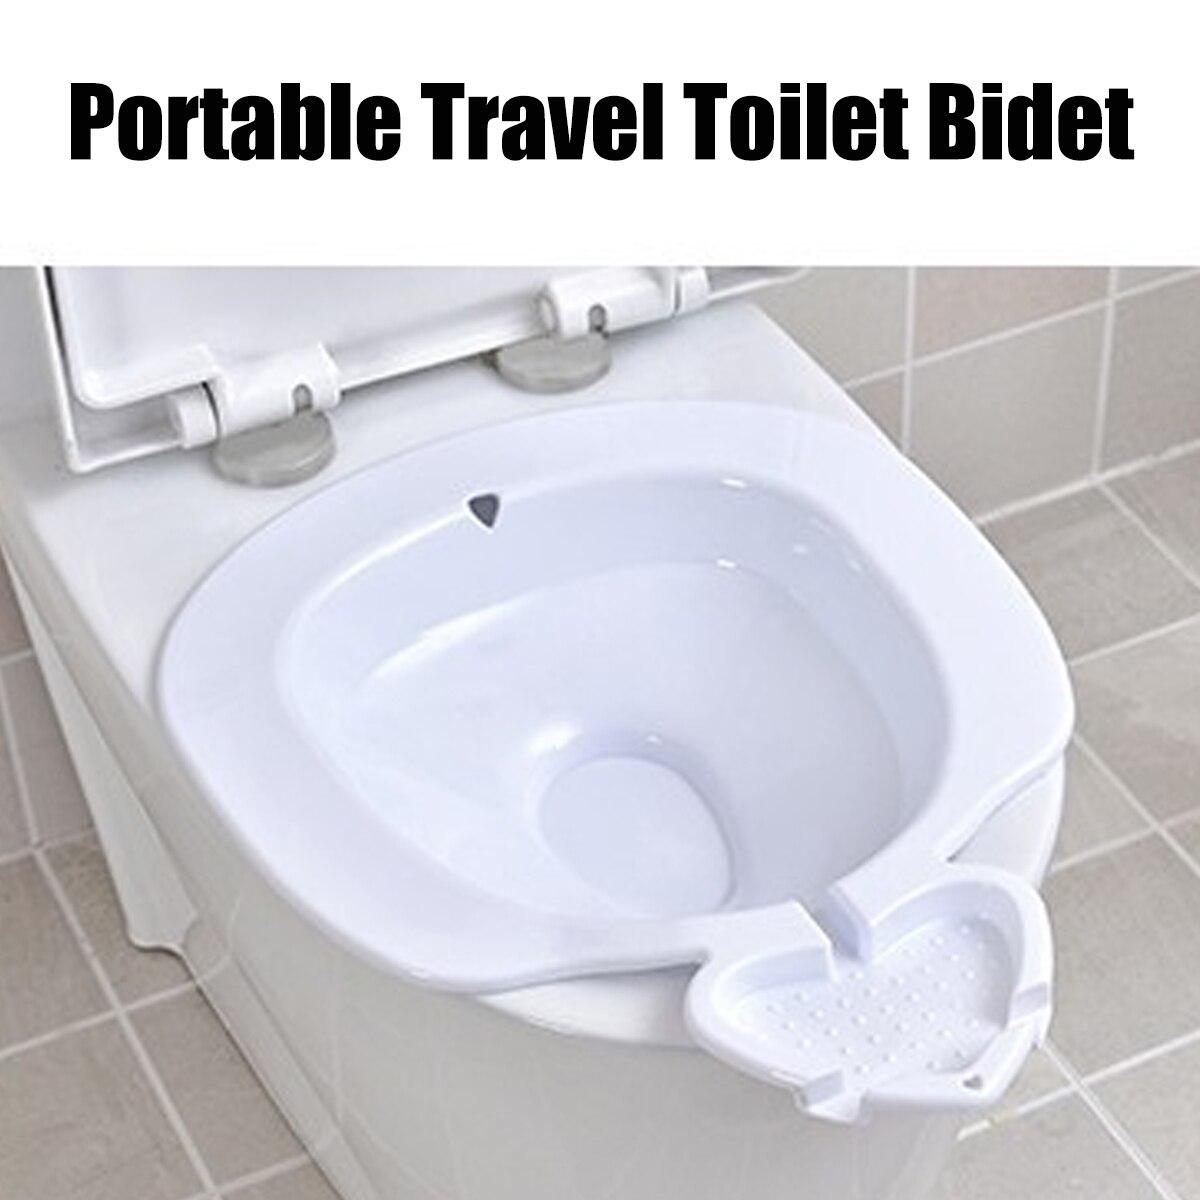 Portable Travel Toilet Bidet Personal Hygiene Camping